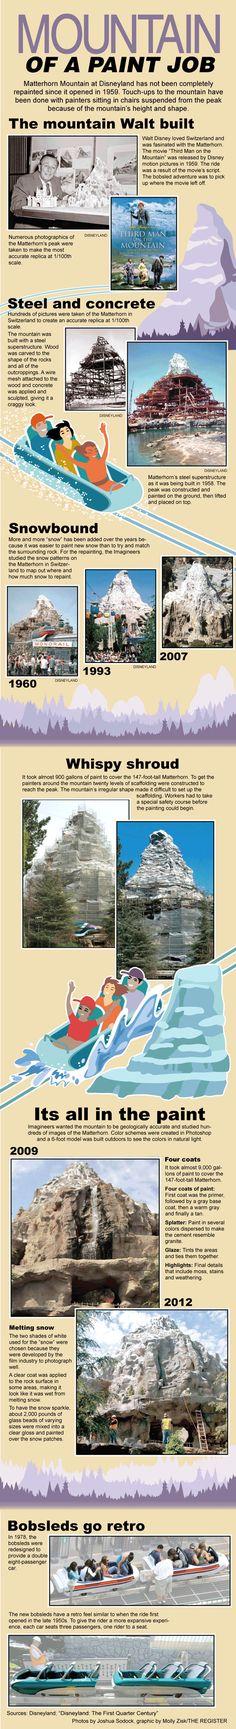 Disneyland Matterhorn repainting infographic via The Orange County Register (May 3, 2012).